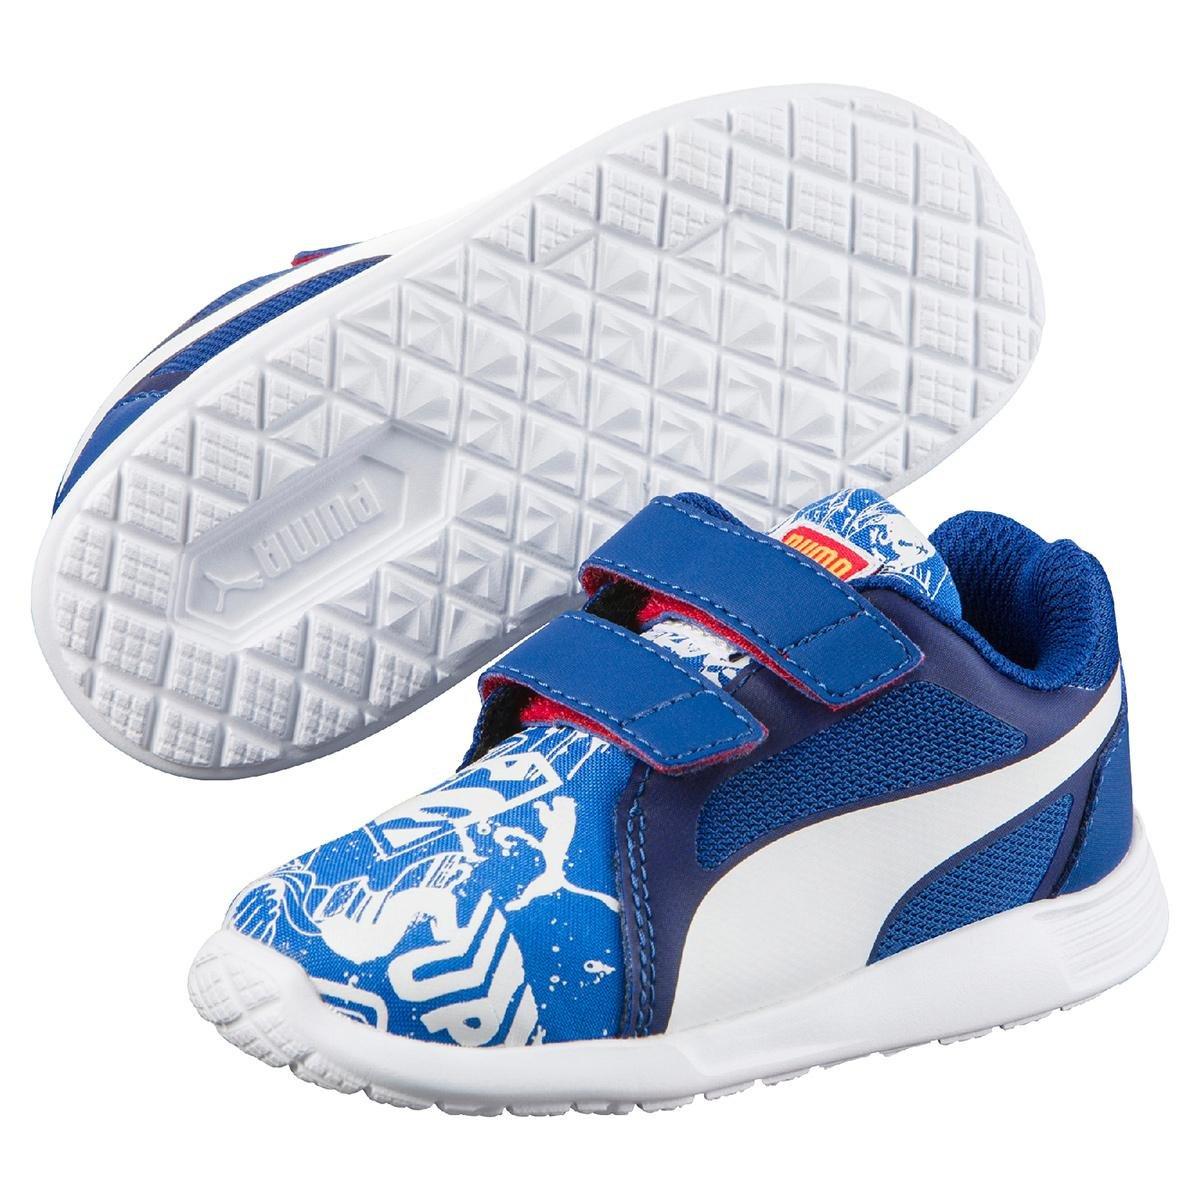 e0a32a56f Tênis Infantil Puma St Trainr Evo Superman V - Azul e Branco | Netshoes